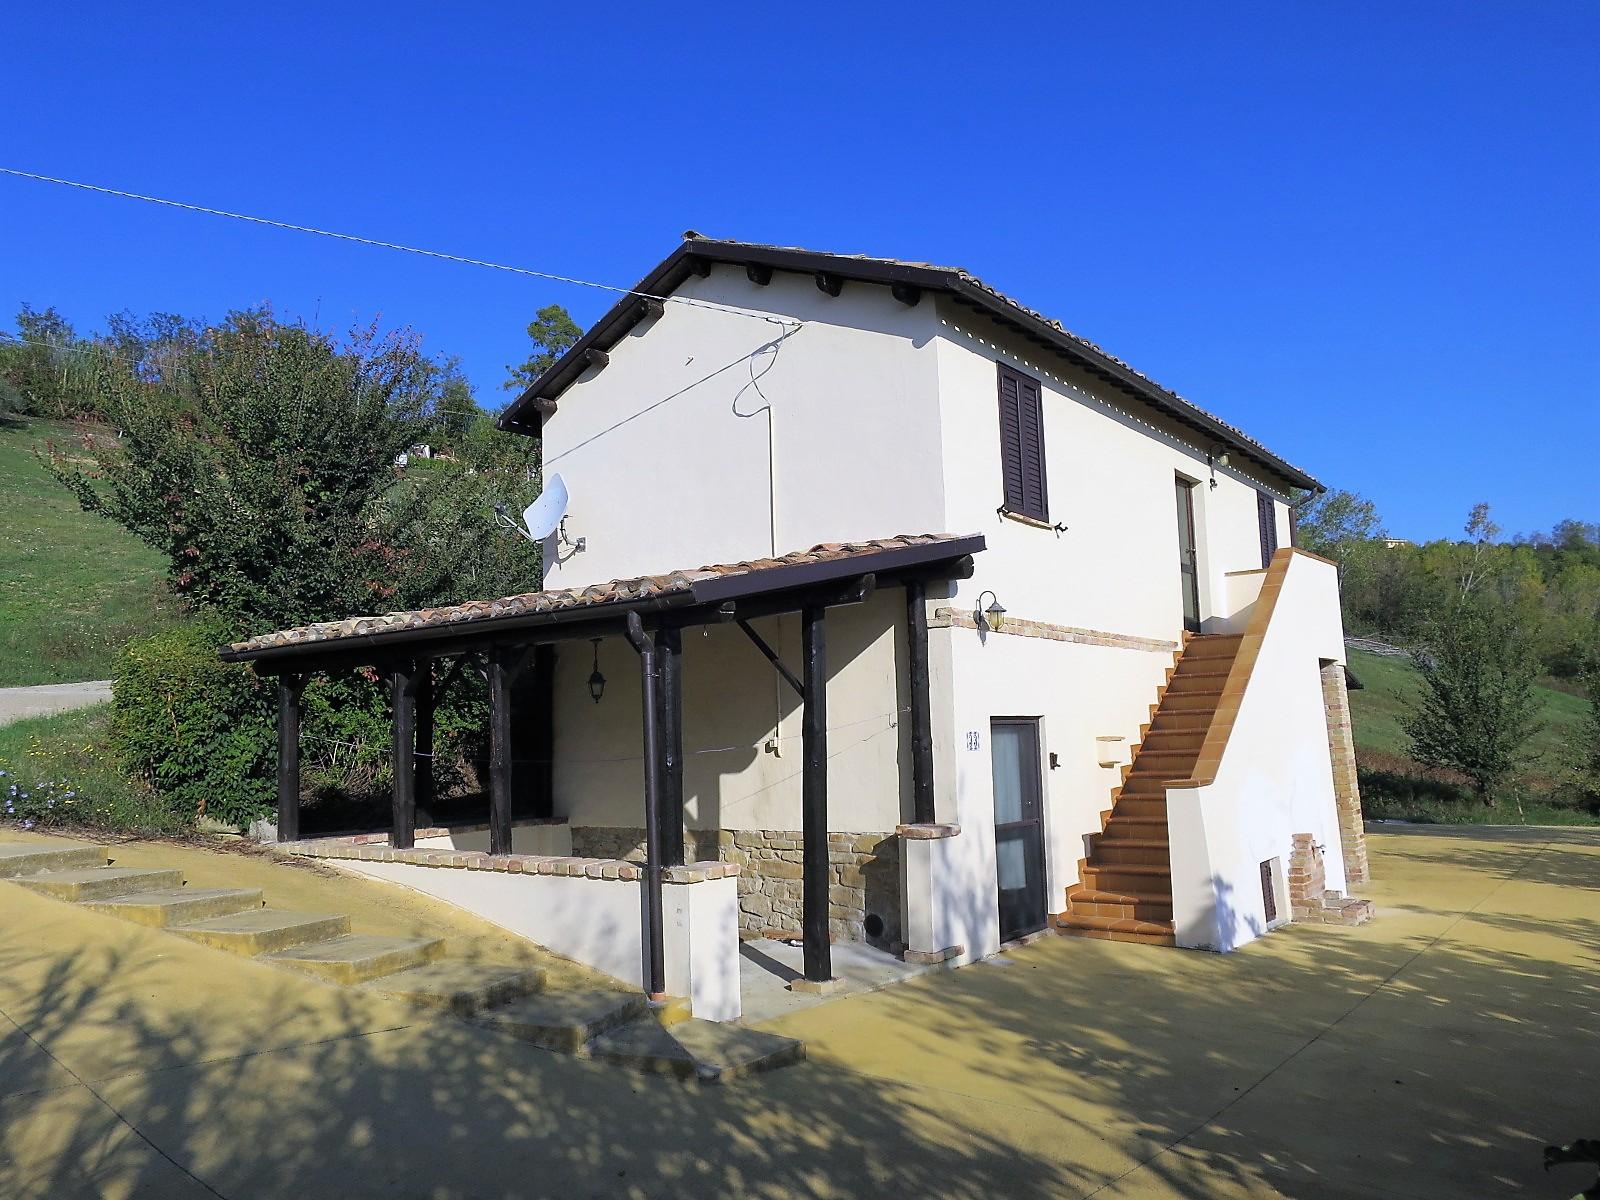 Country Houses Country Houses for sale Montefino (TE), Casa Collina - Montefino - EUR 151.447 10